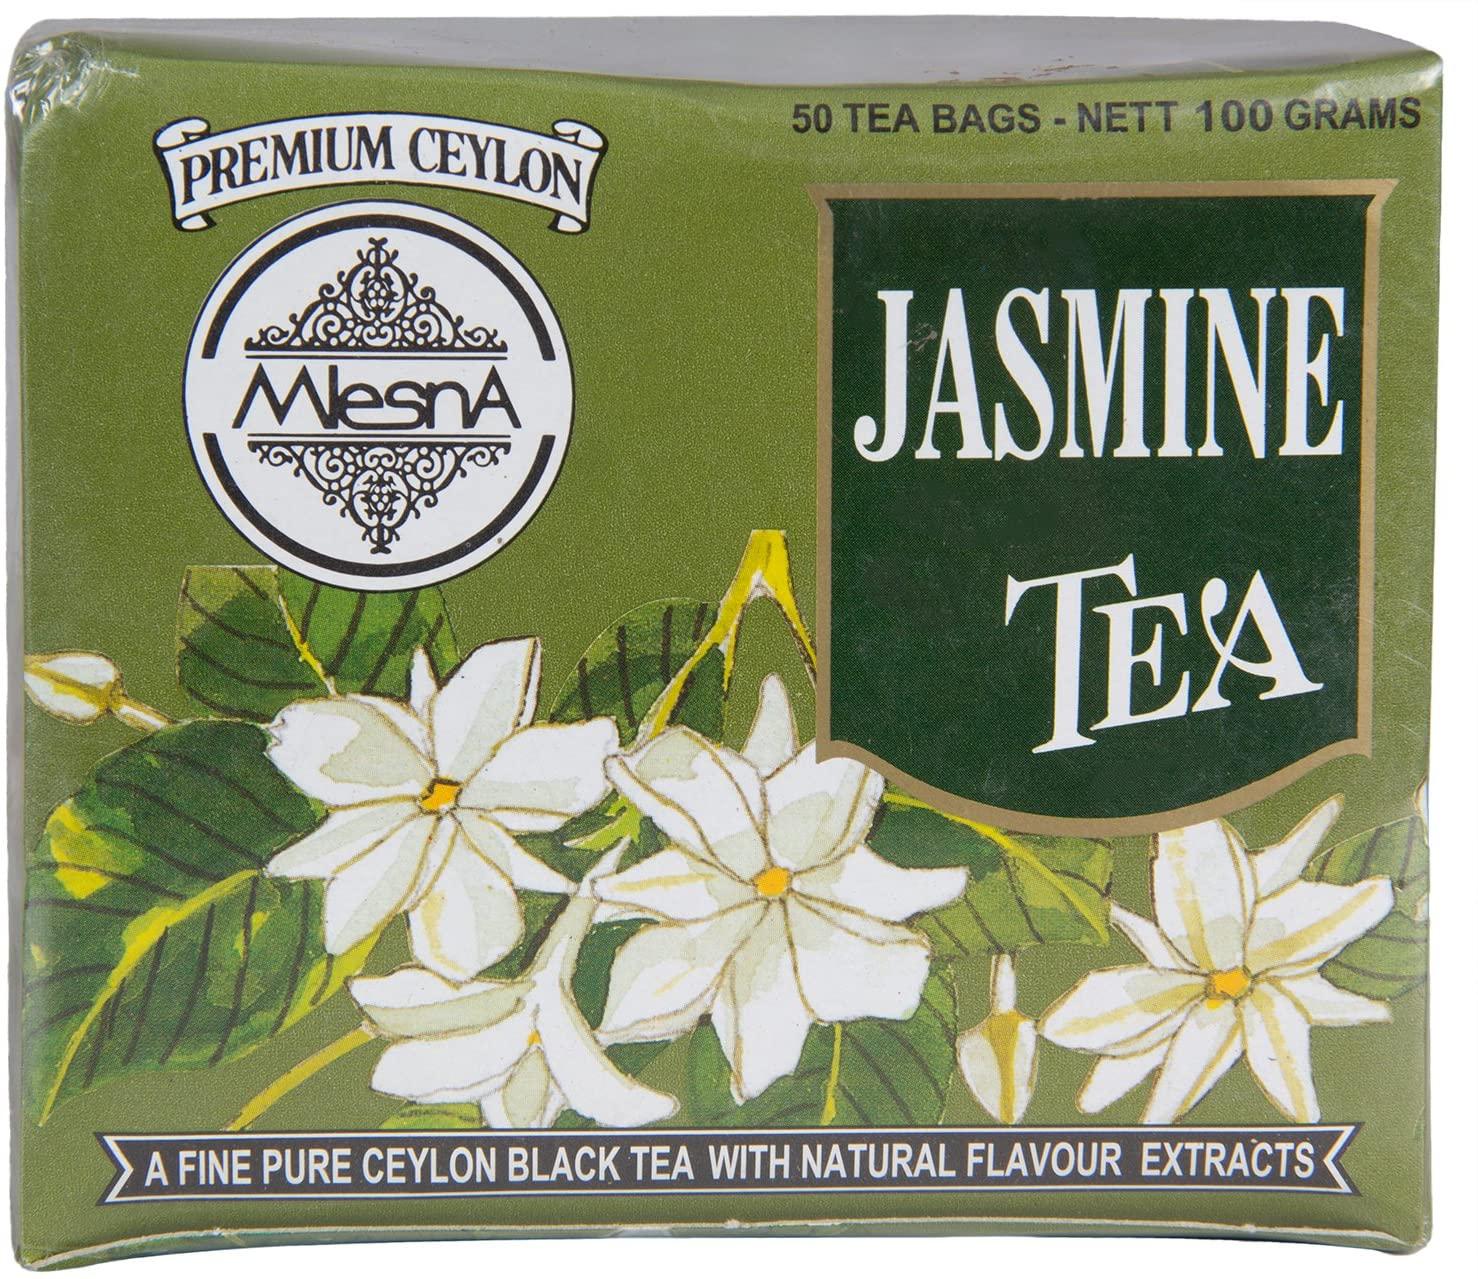 Mlesna Pure Ceylon Jasmine Green Tea - 50 Tea Bags 100g Box